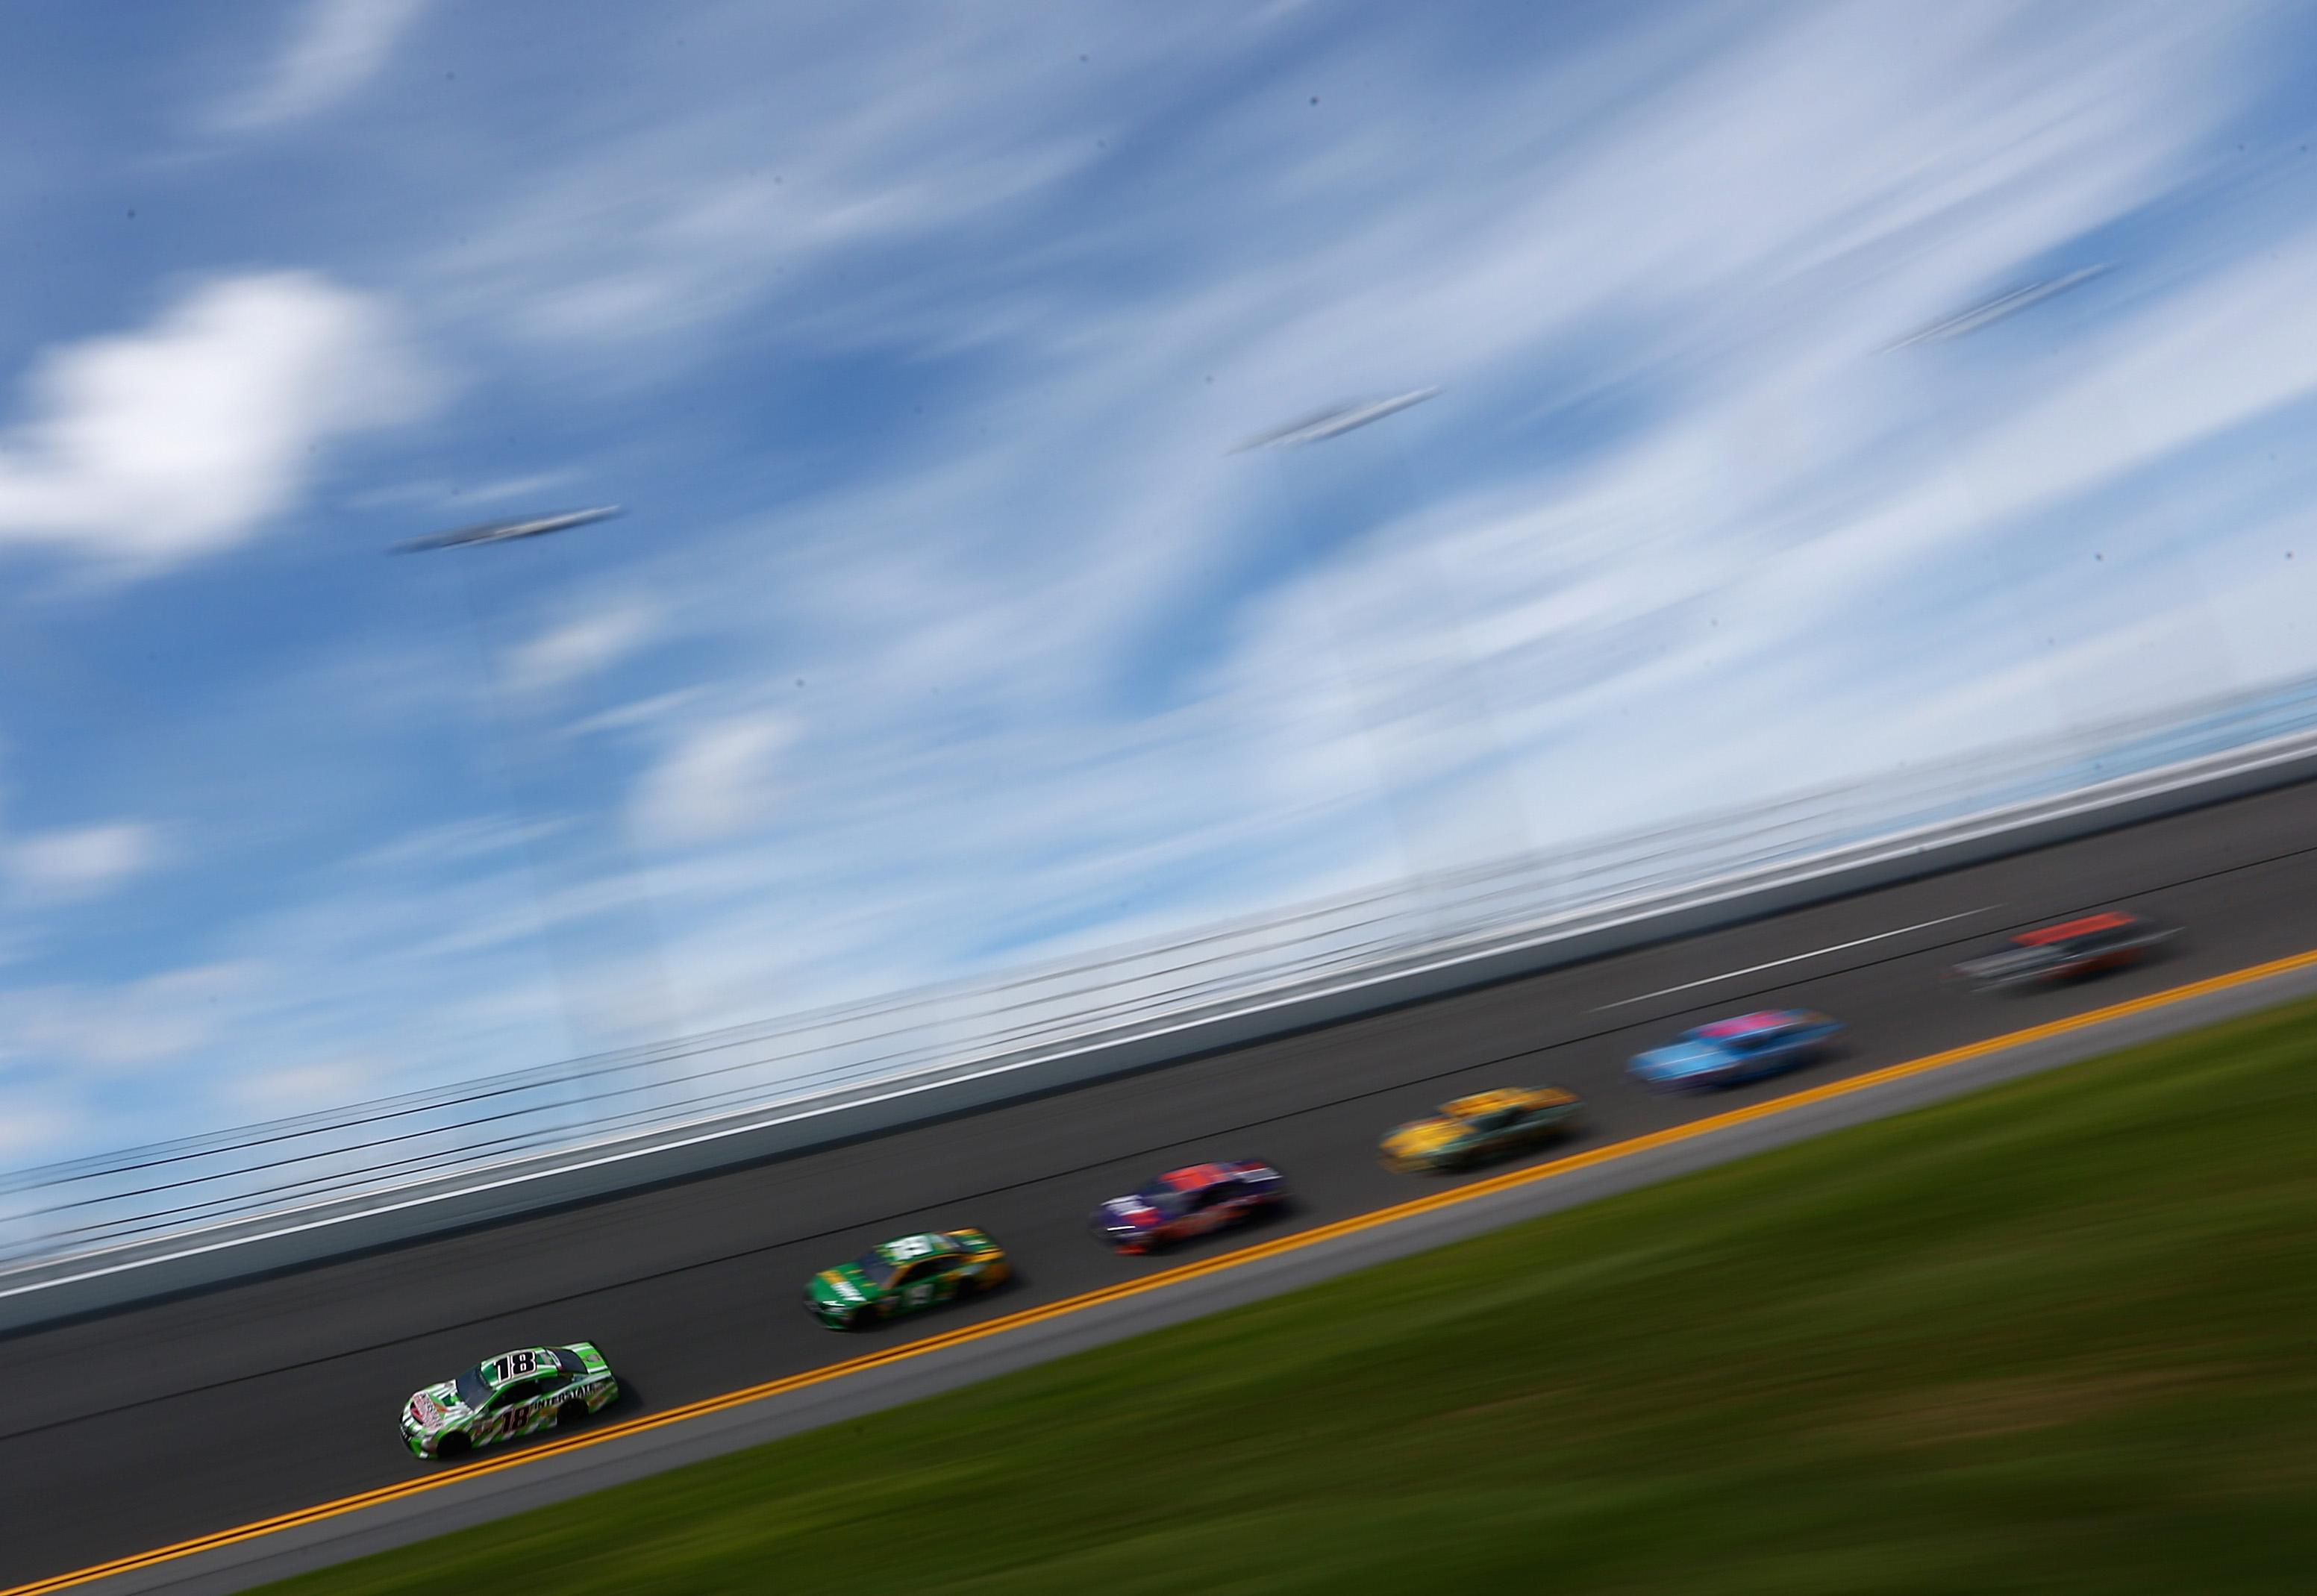 NBCSN Daytona International Speedway